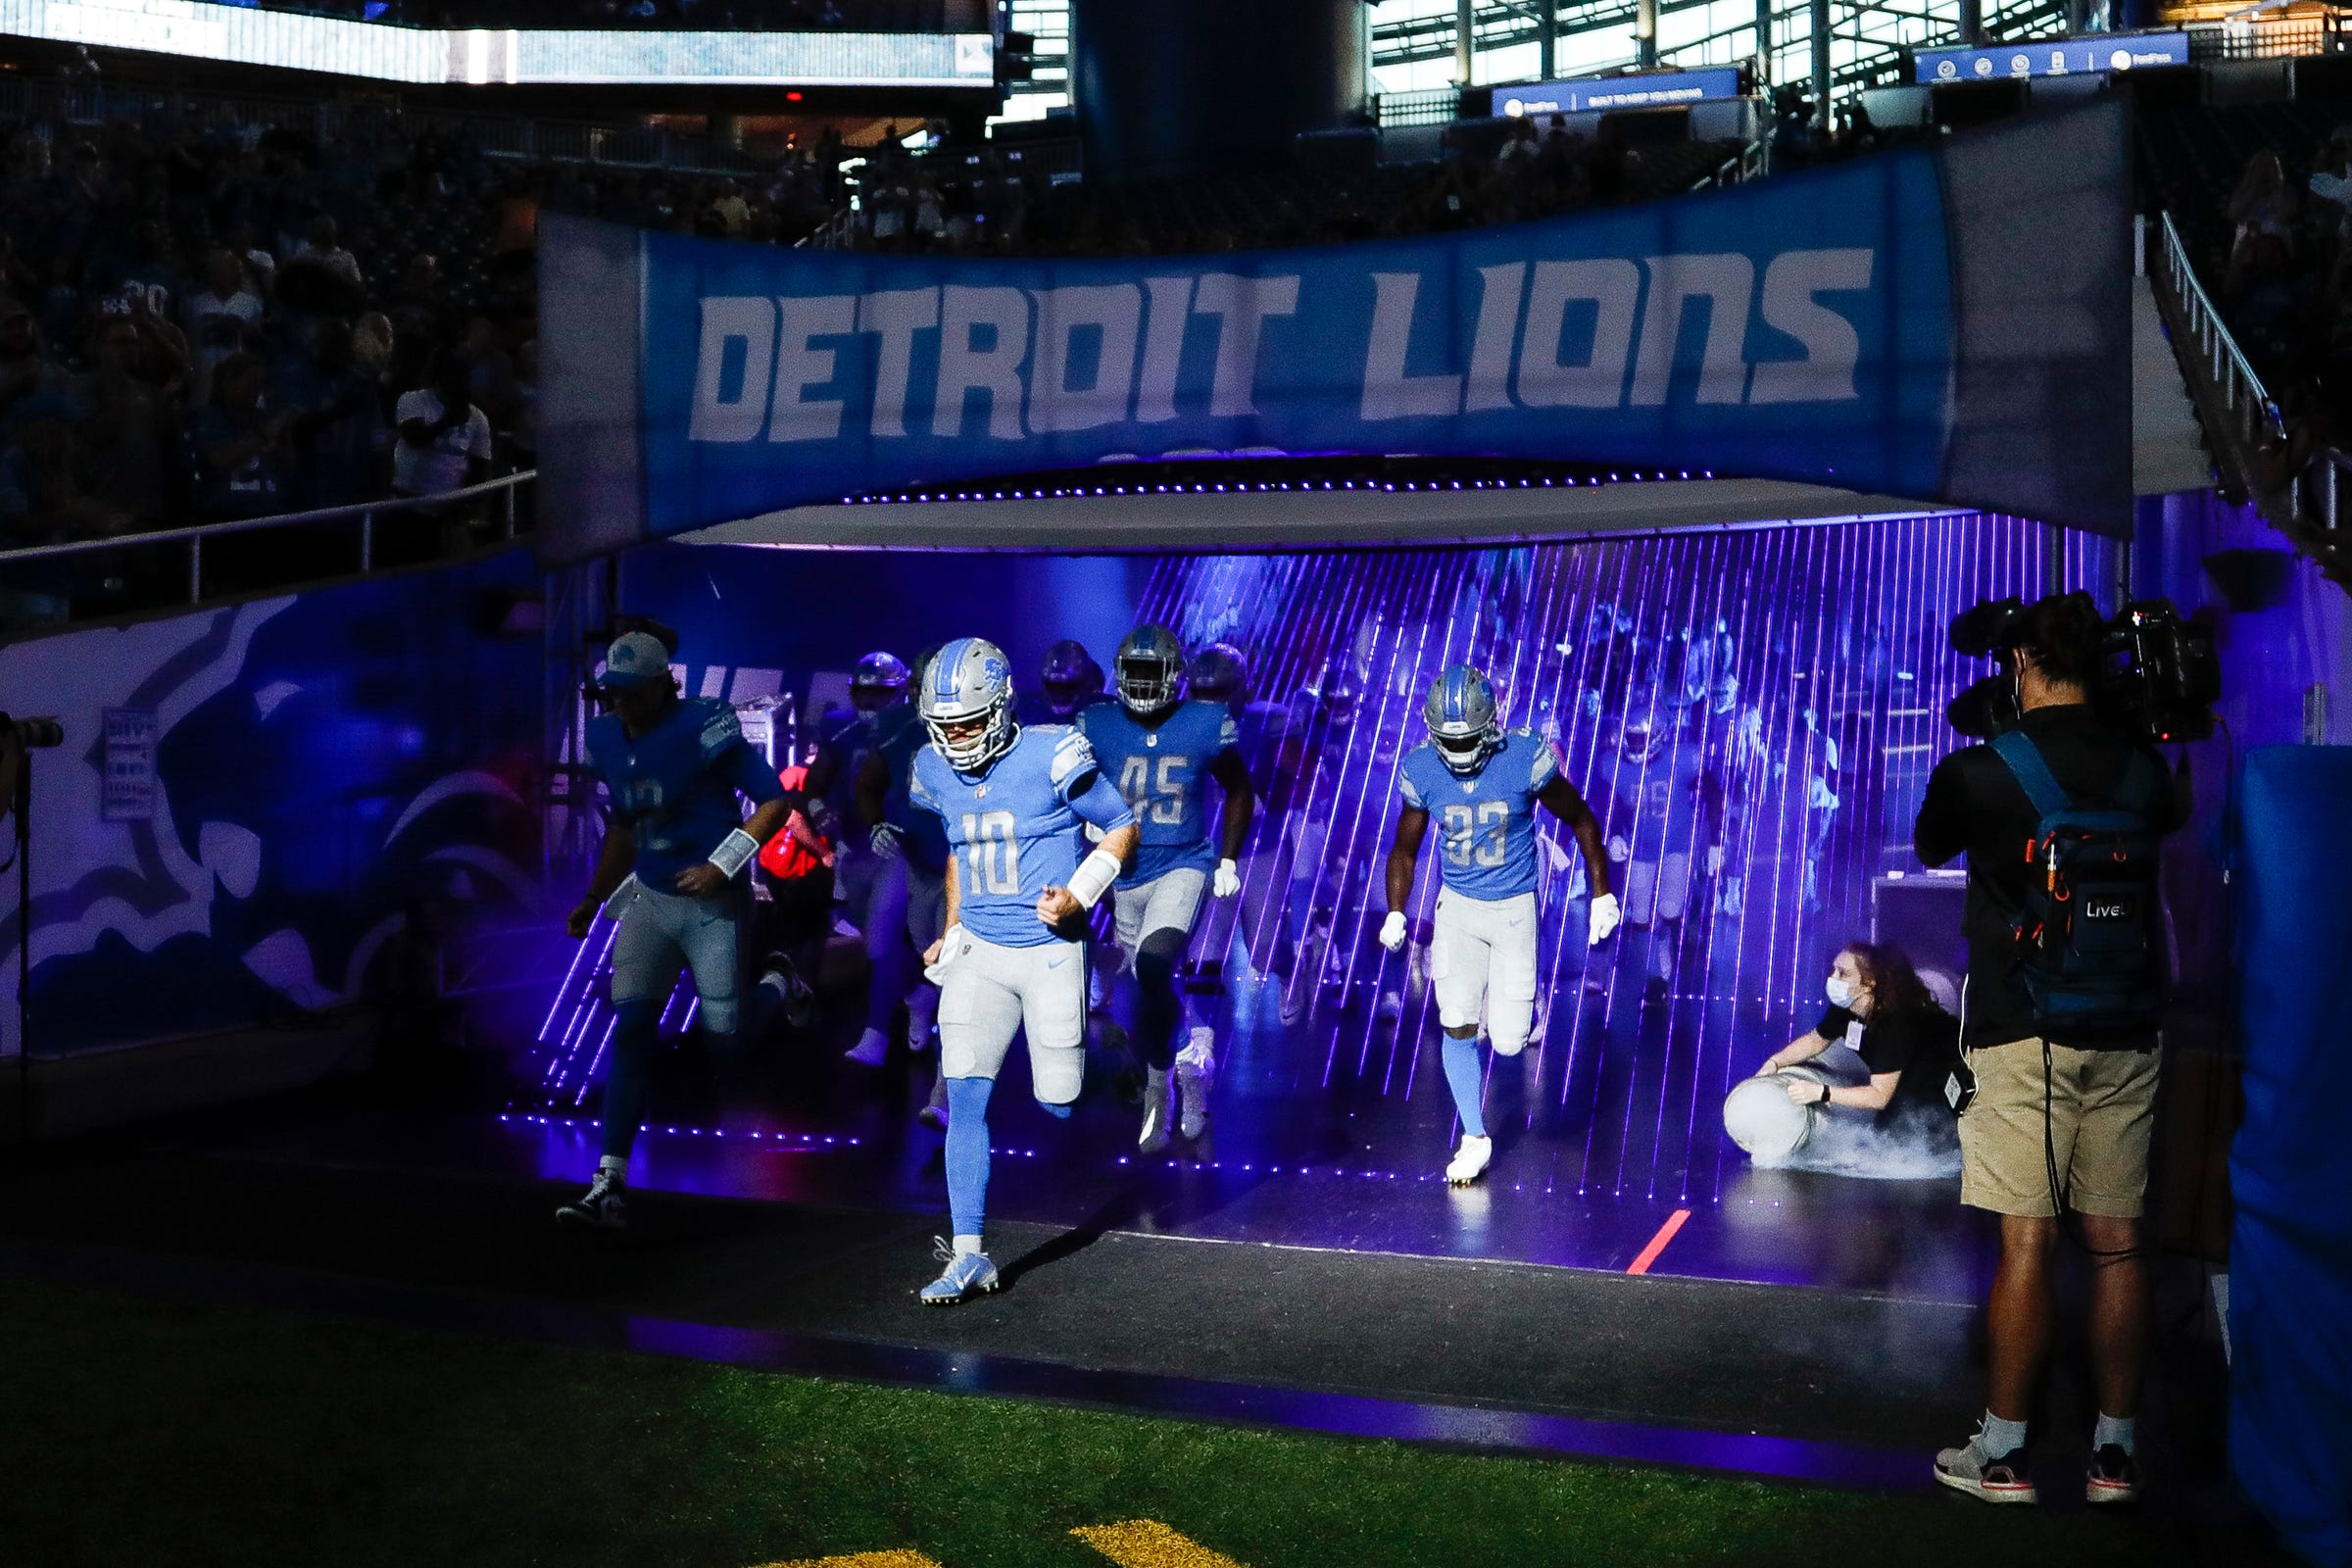 Syndication: Detroit Free Press